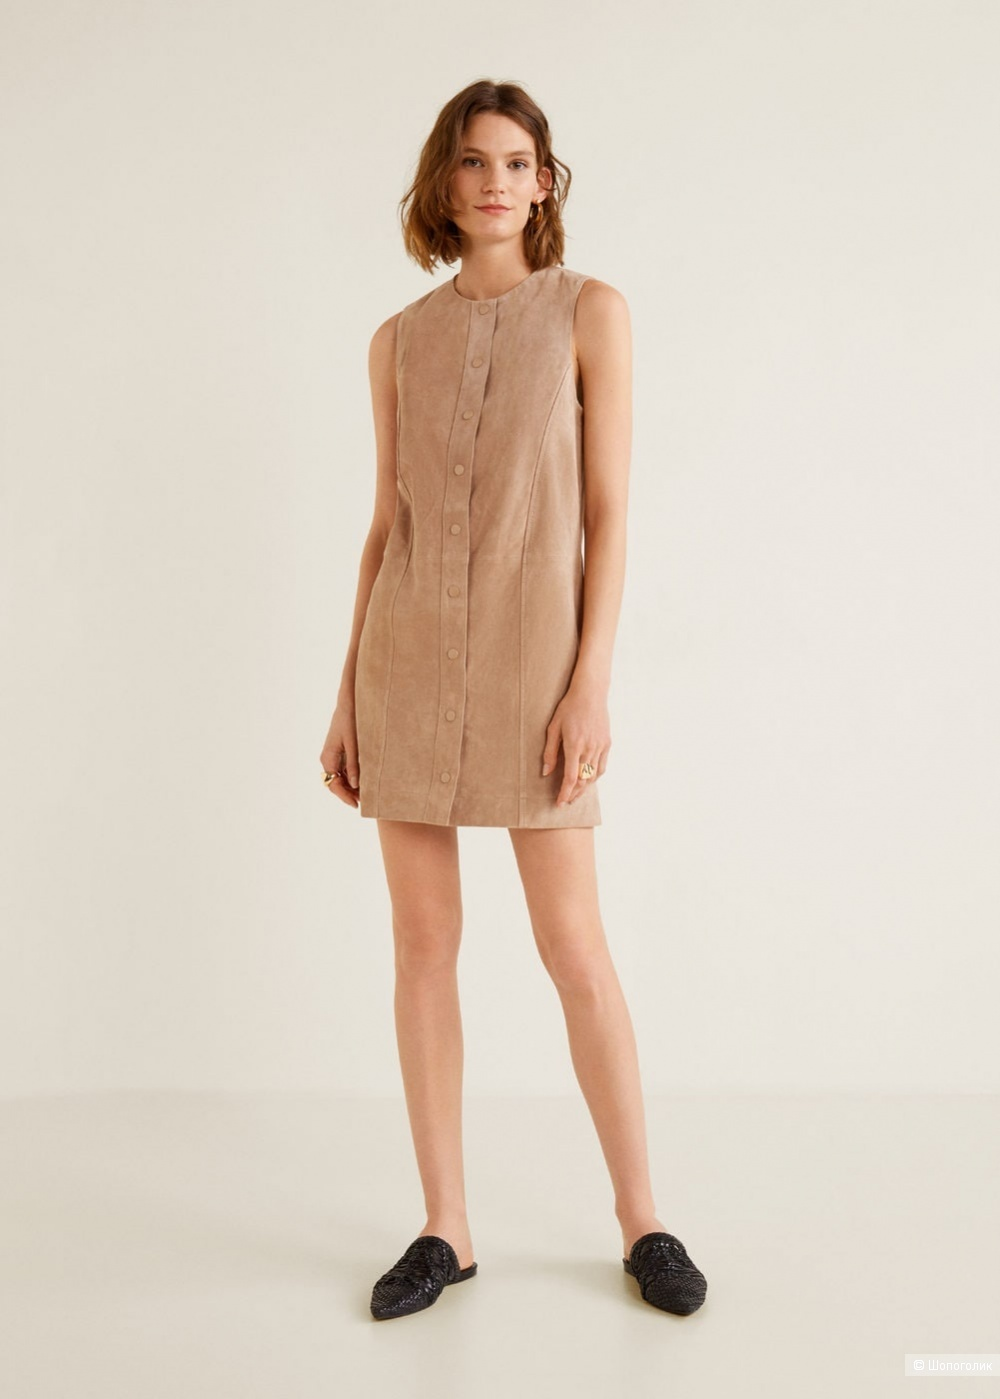 Платье-сарафан, замша, Mango, L